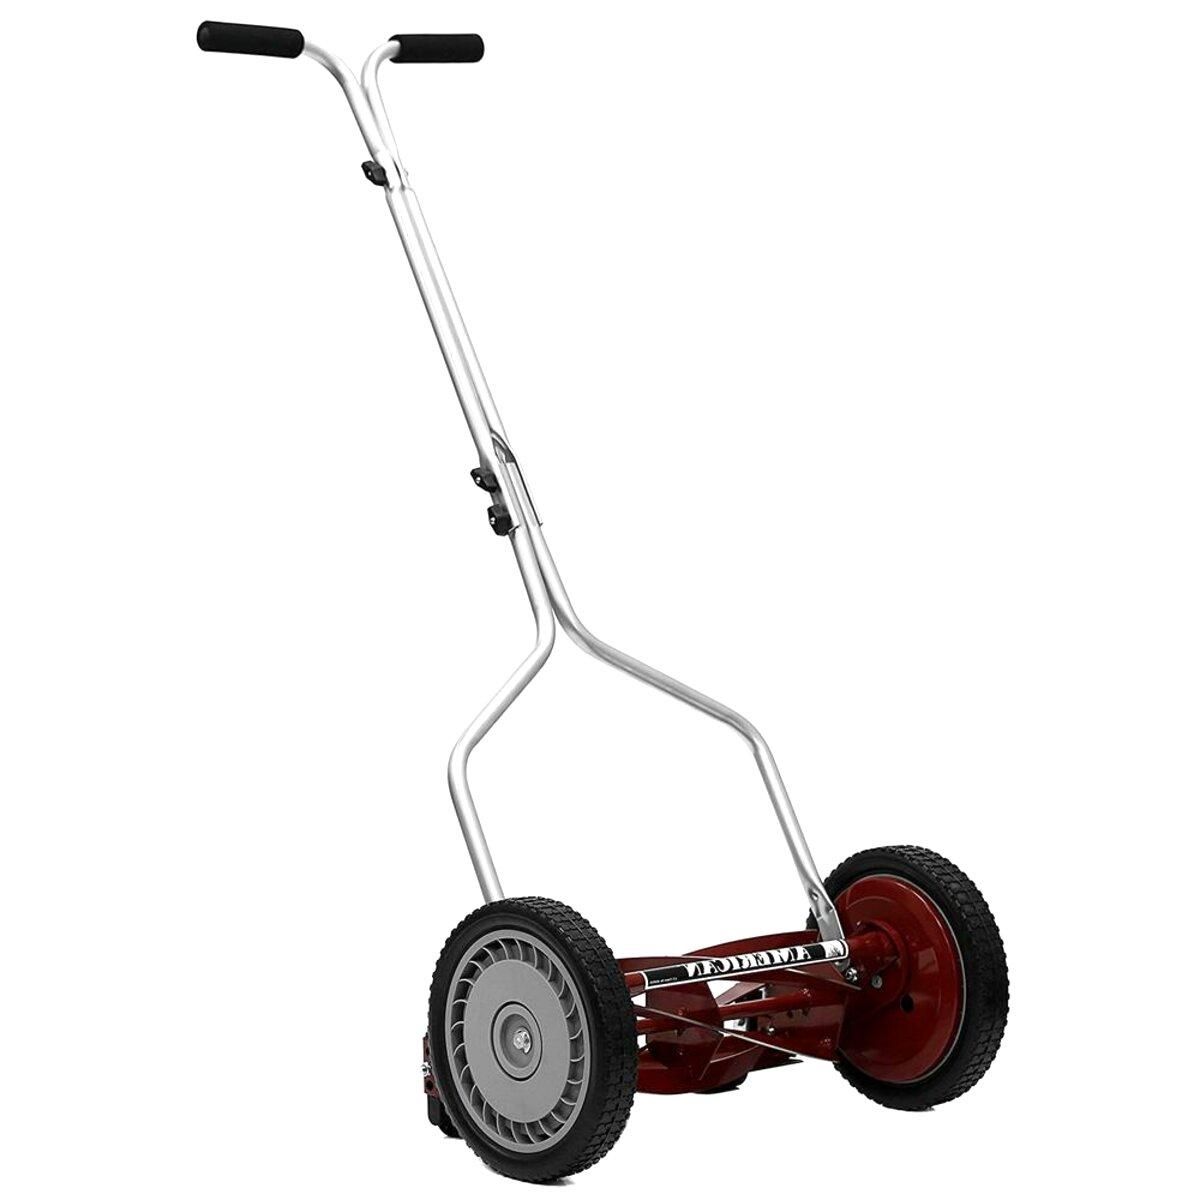 reel lawn mower for sale